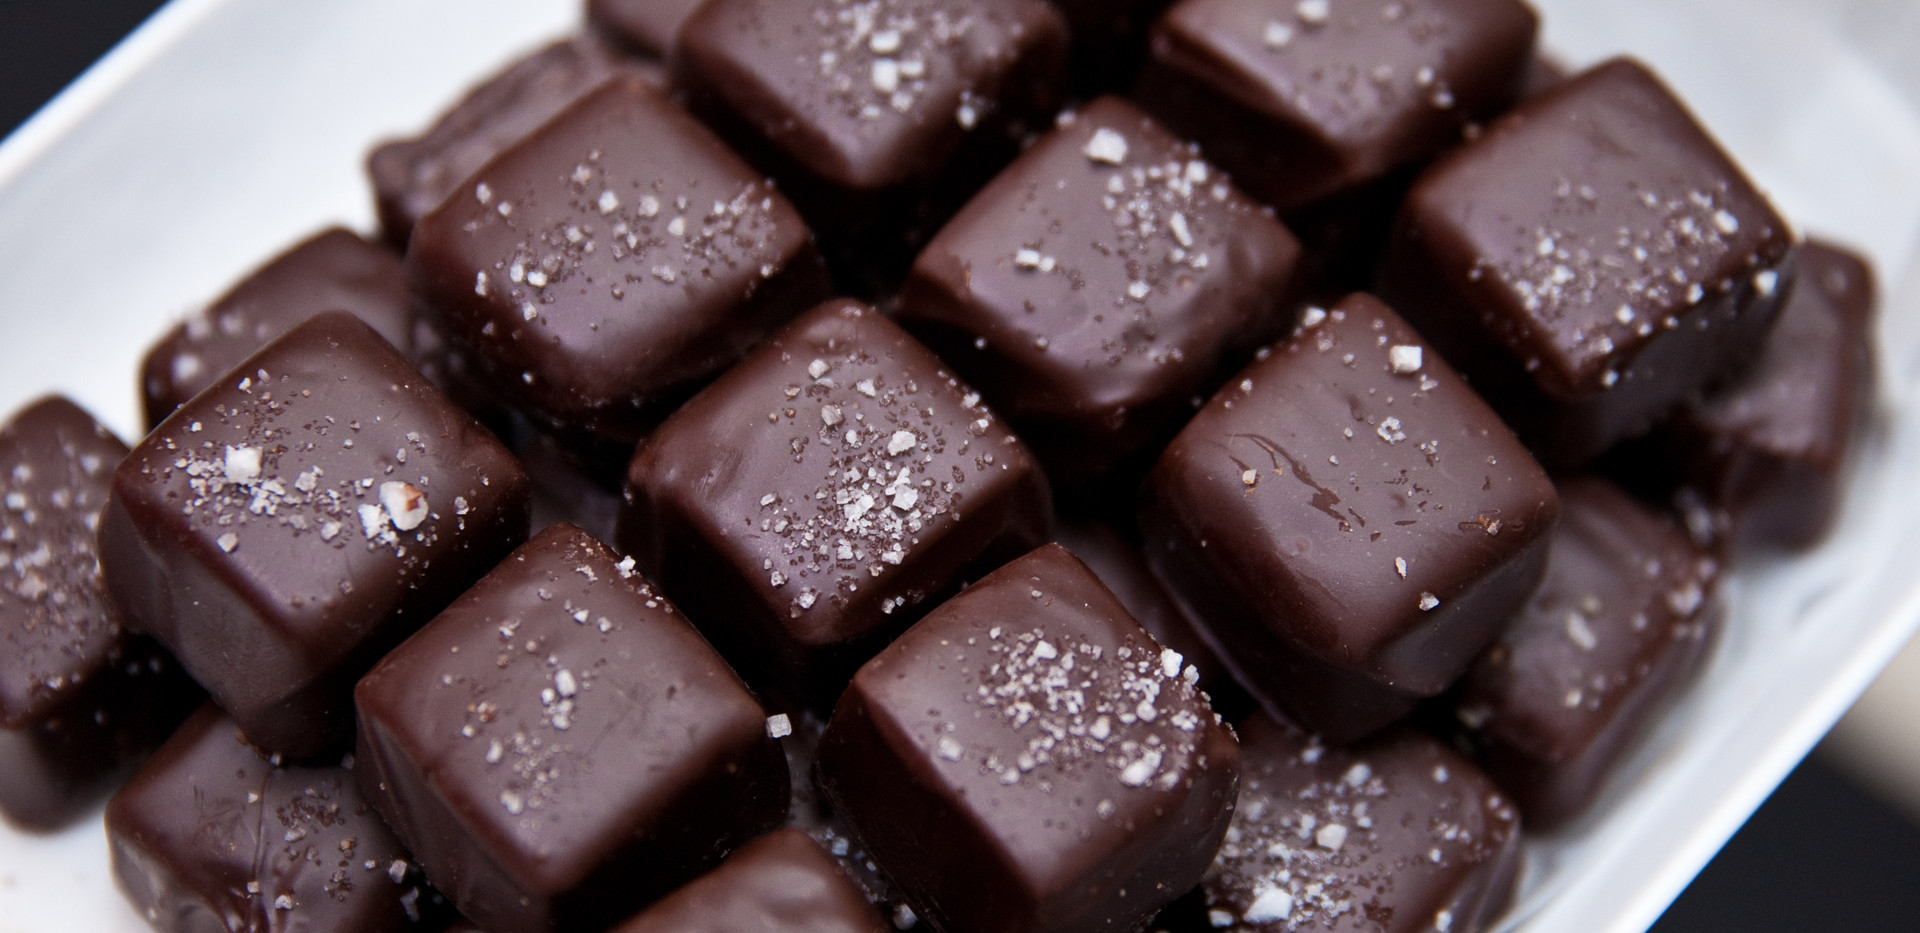 Salted Caramel - Dark